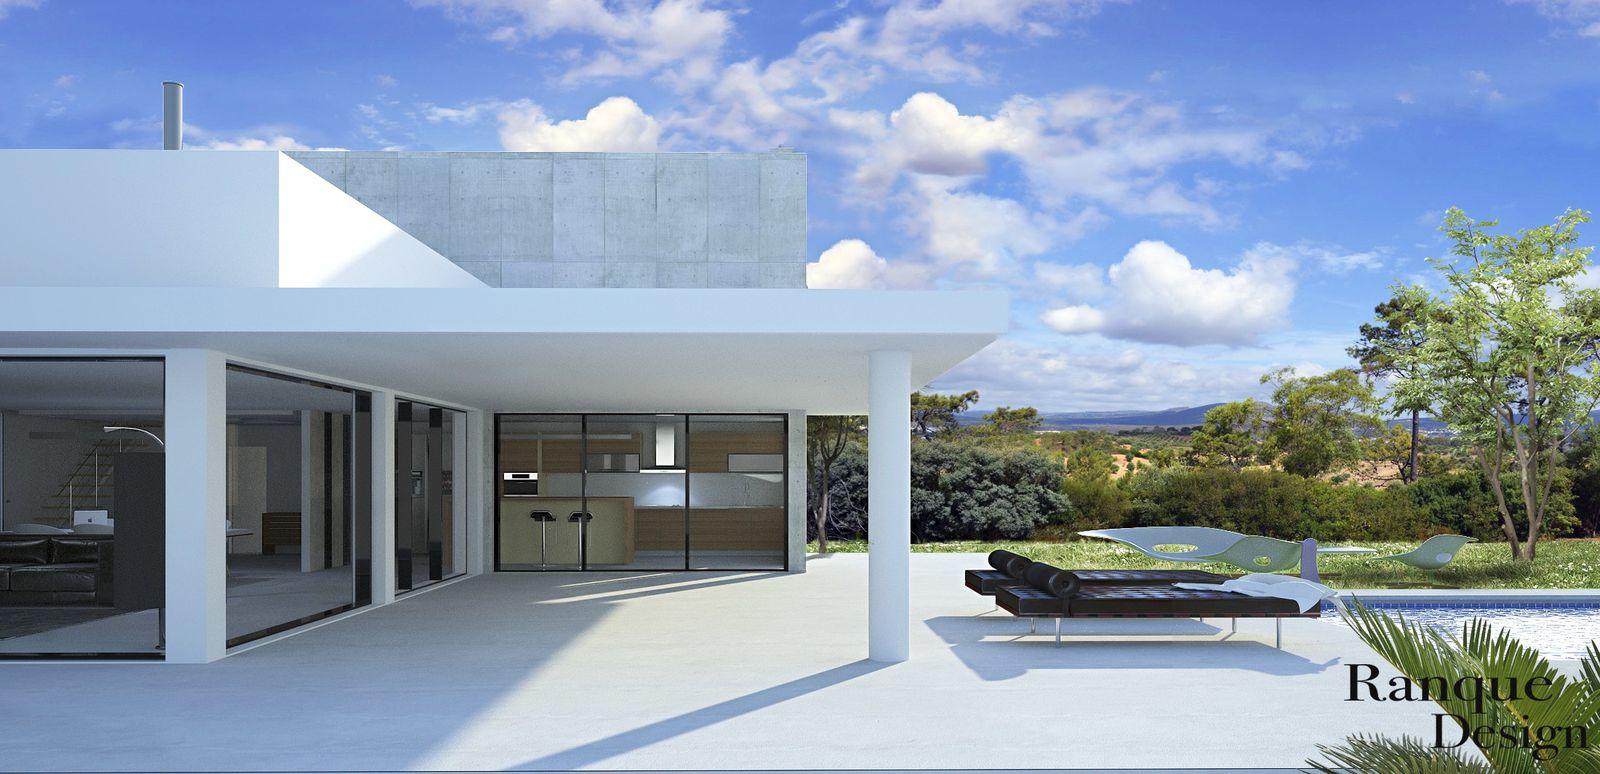 suite cr ation maison ramatuelle. Black Bedroom Furniture Sets. Home Design Ideas